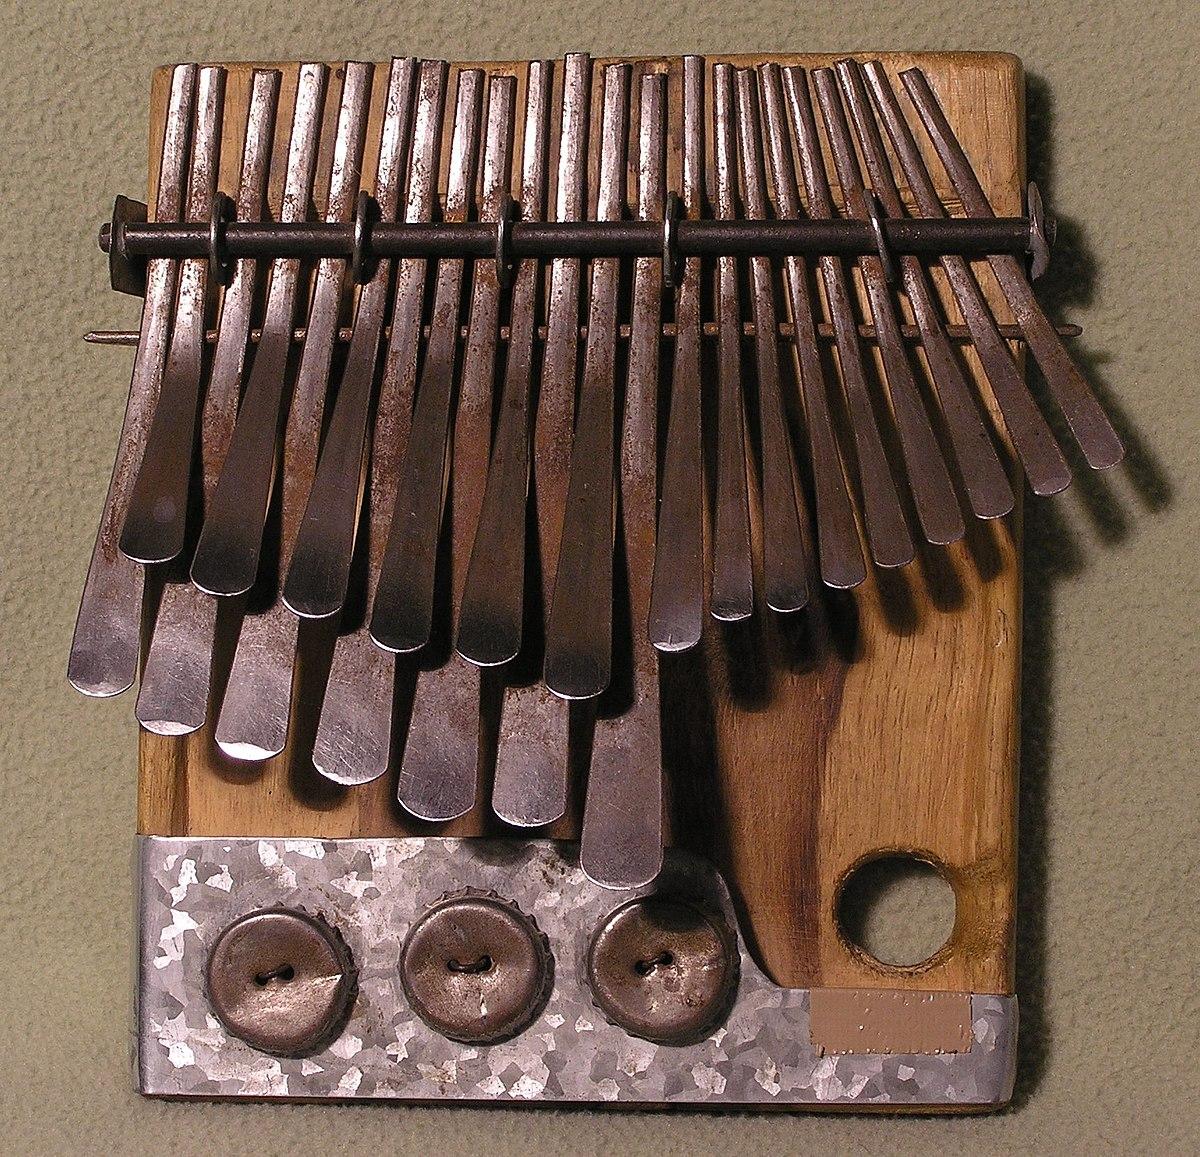 Music of Africa - Wikipedia